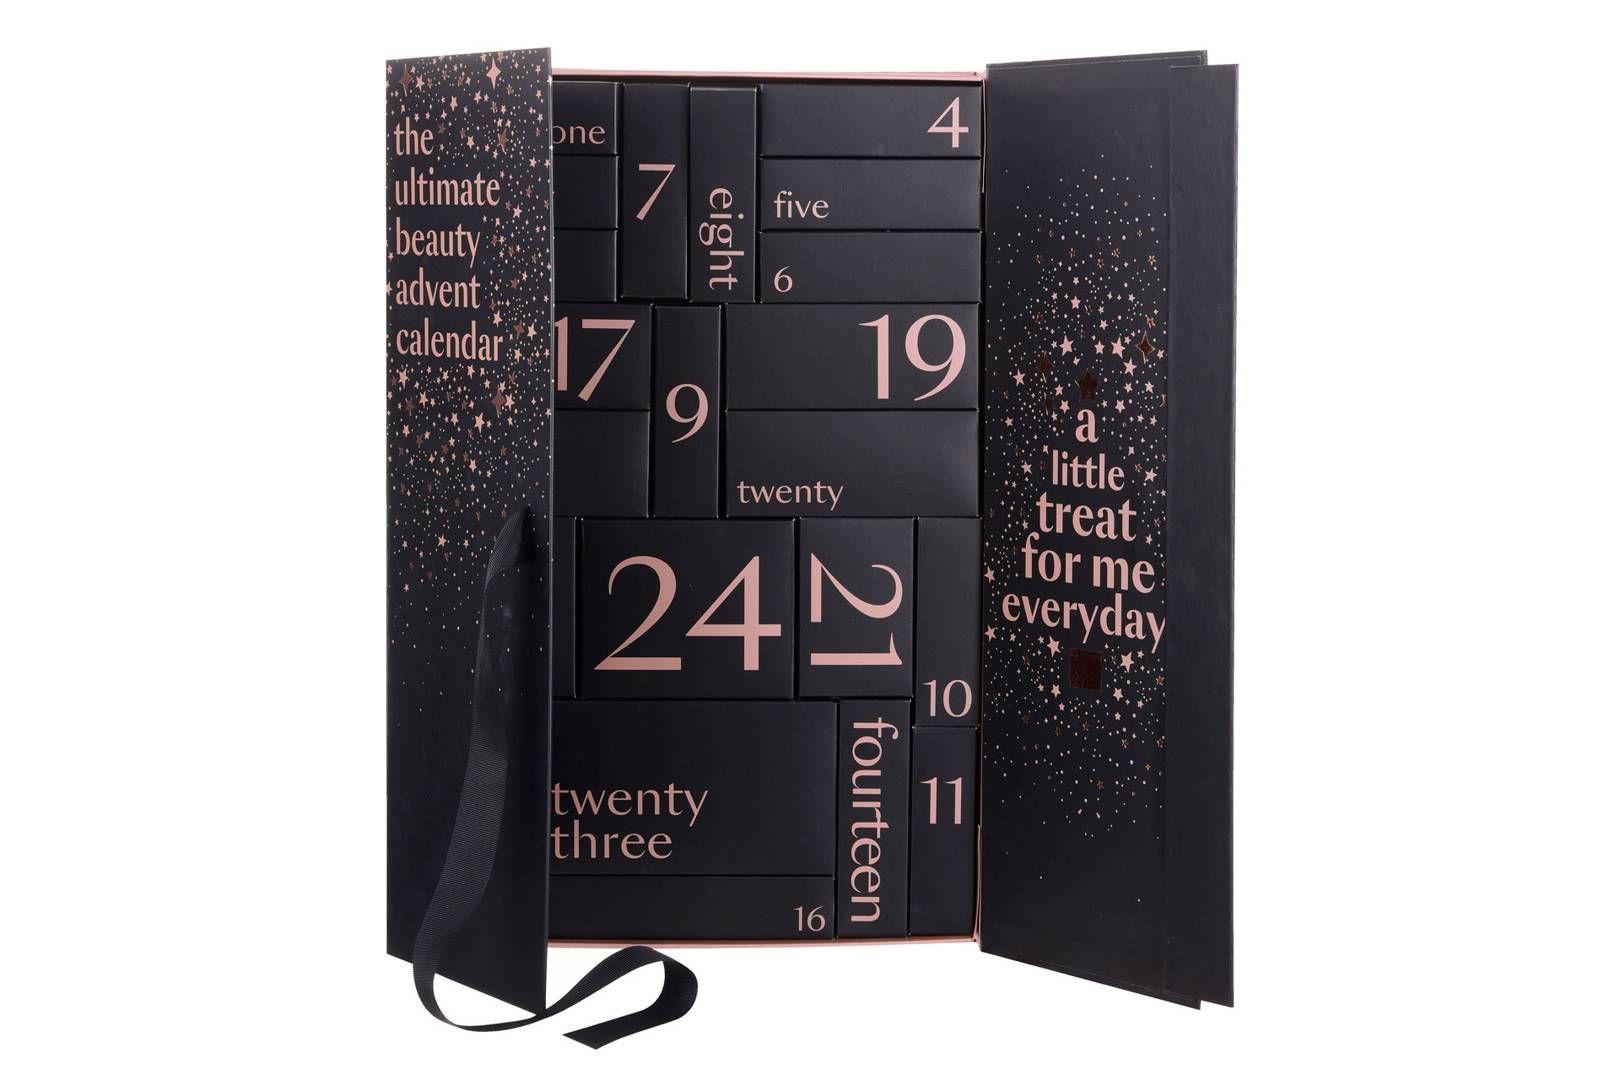 96 best beauty advent calendars for christmas 2019